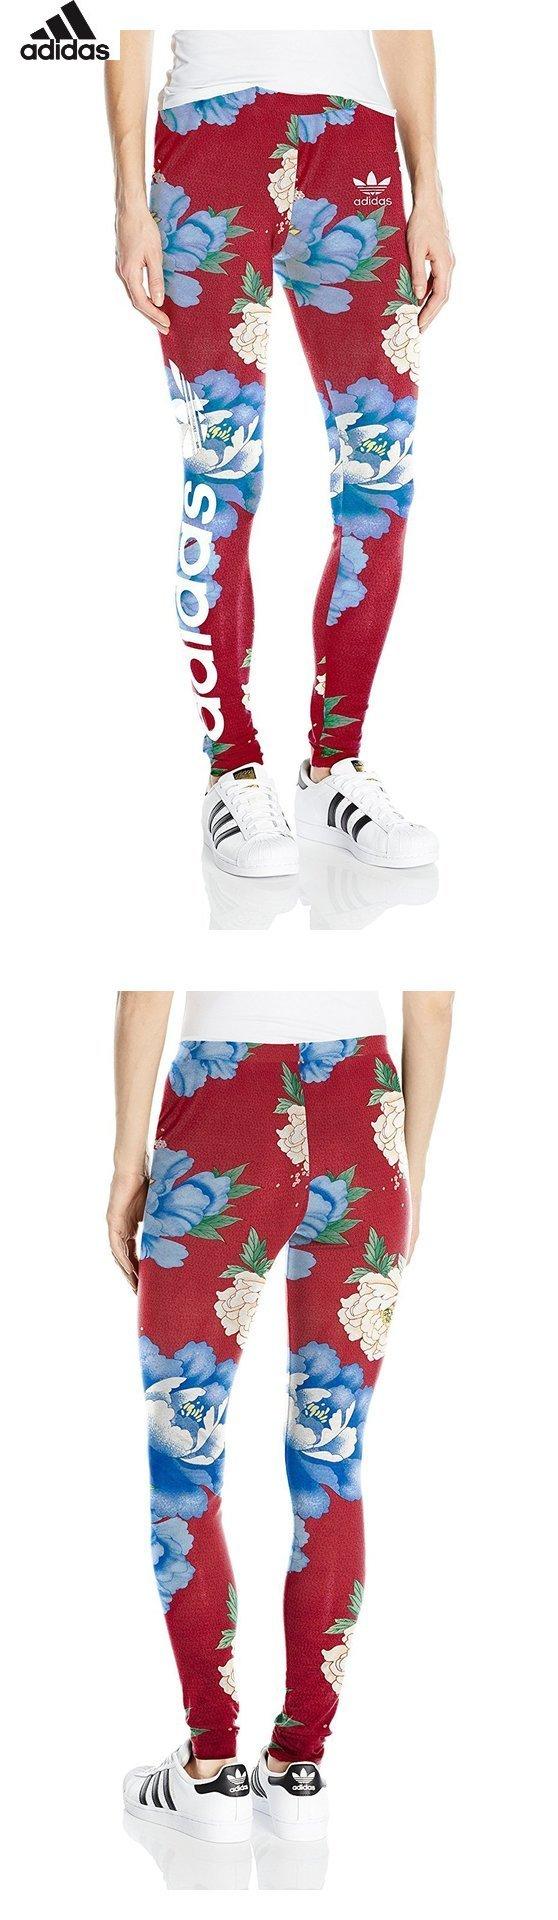 35 Adidas Originals Women S Linear Leggings Farm Chita Floral Xs Adidas Originals Women Active Outfits Adidas Originals [ 1920 x 558 Pixel ]